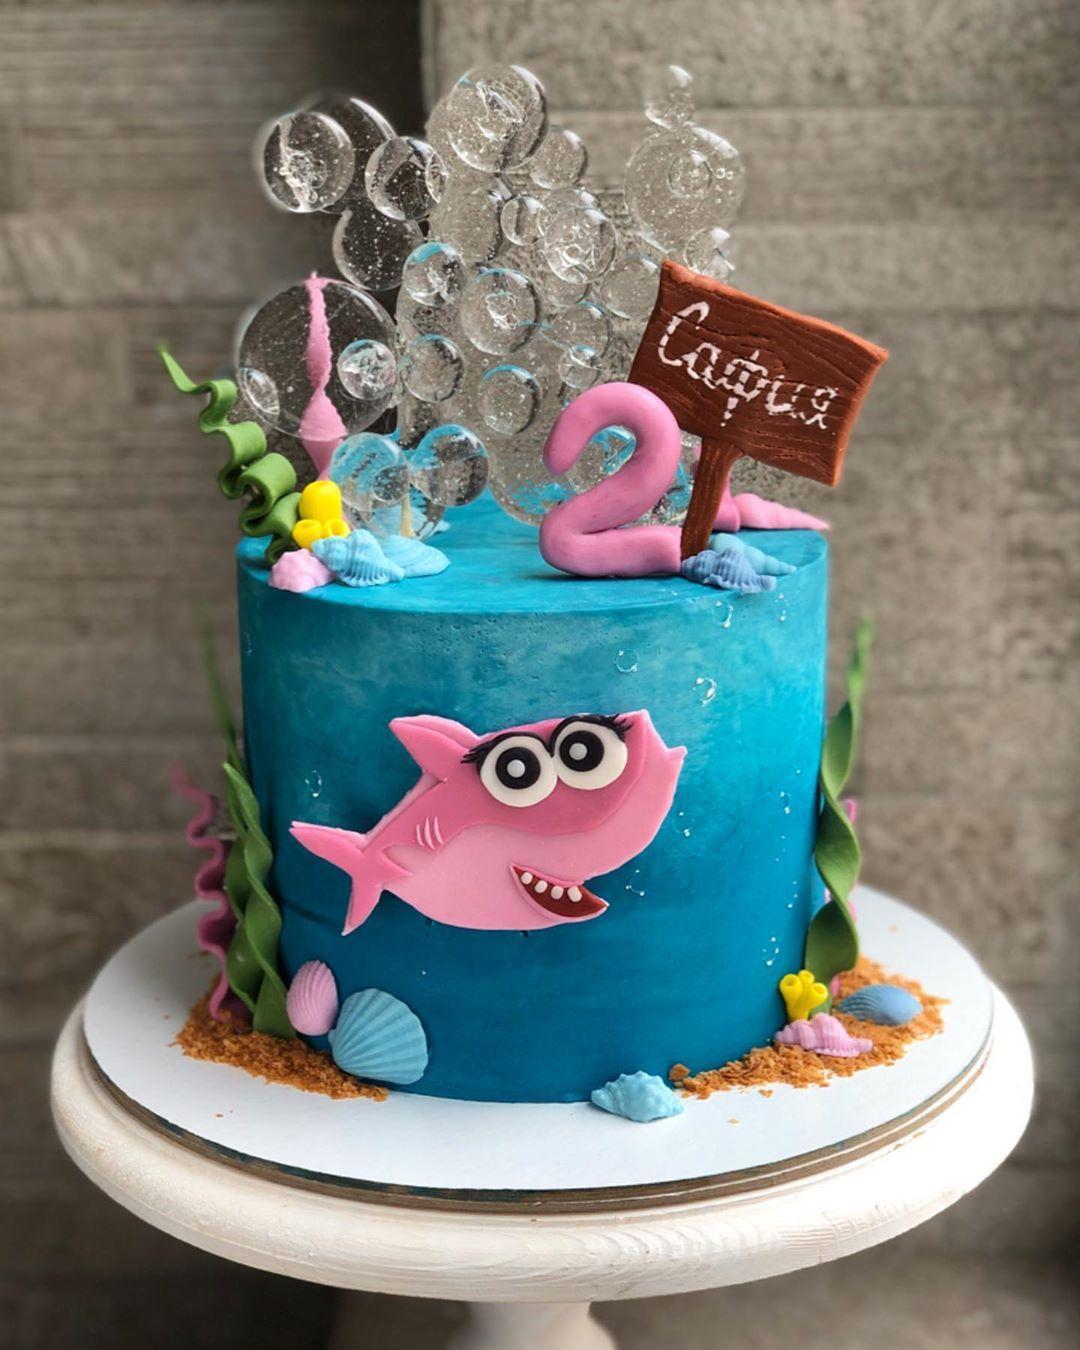 15 Adorable Baby Shark Birthday Cake Ideas (They're So